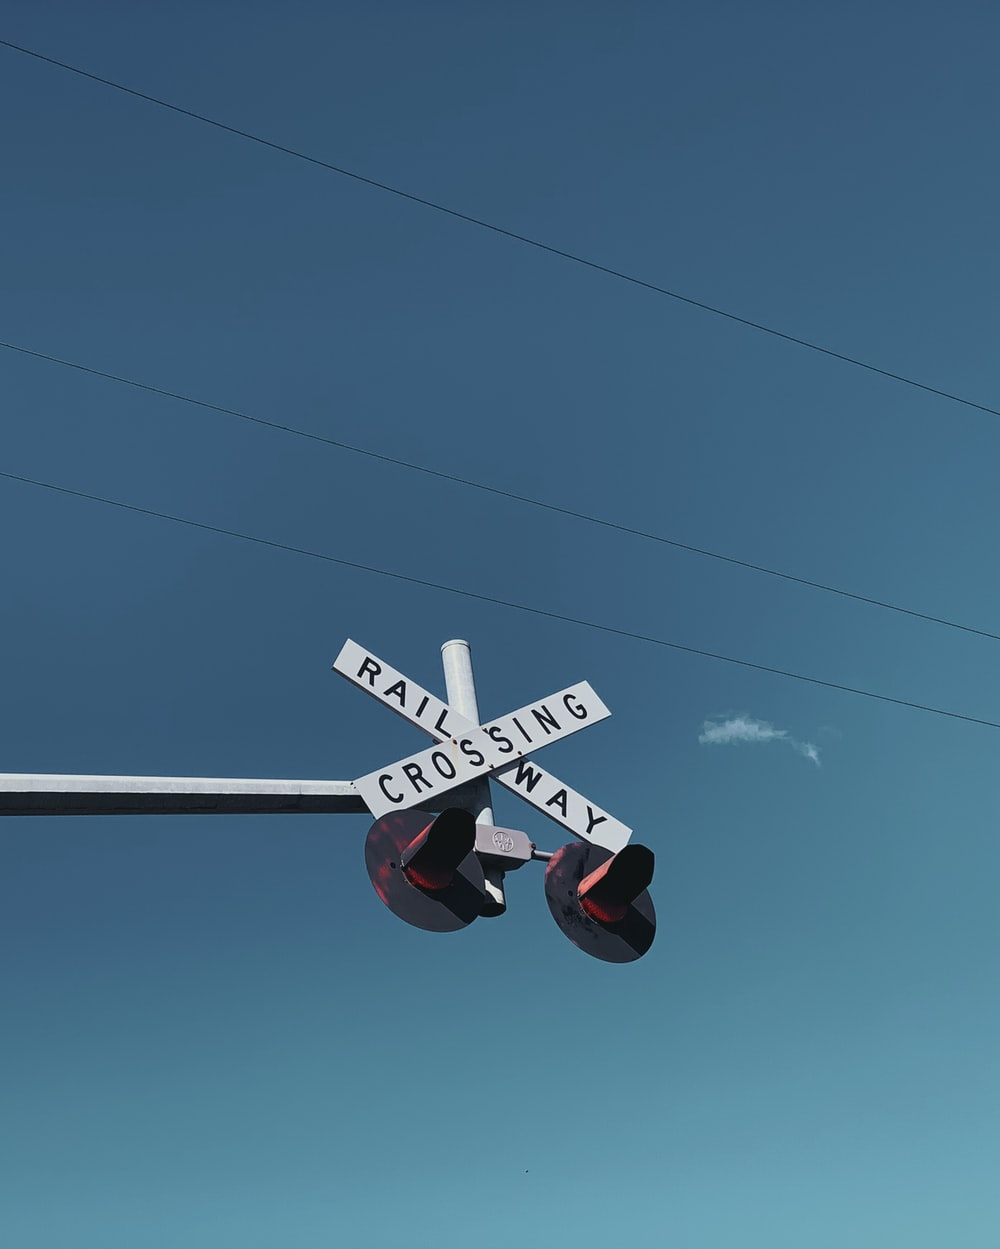 sign of crossing railway